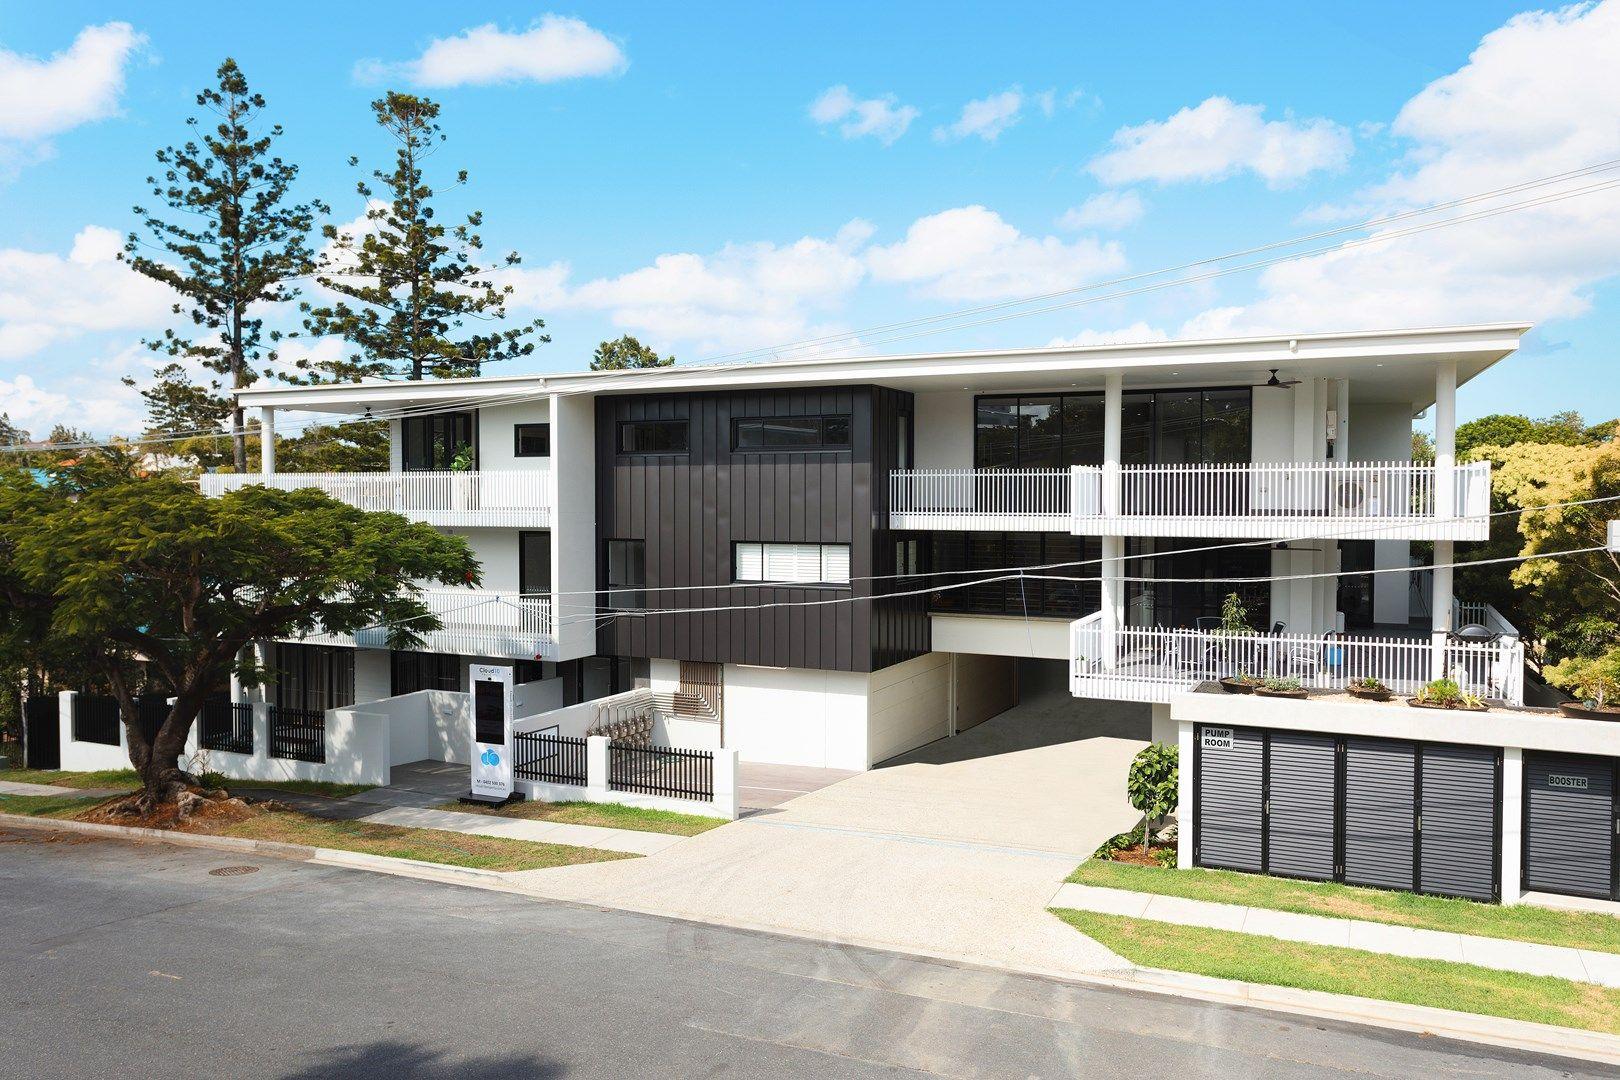 11-15 Dorset Street, Ashgrove QLD 4060, Image 0